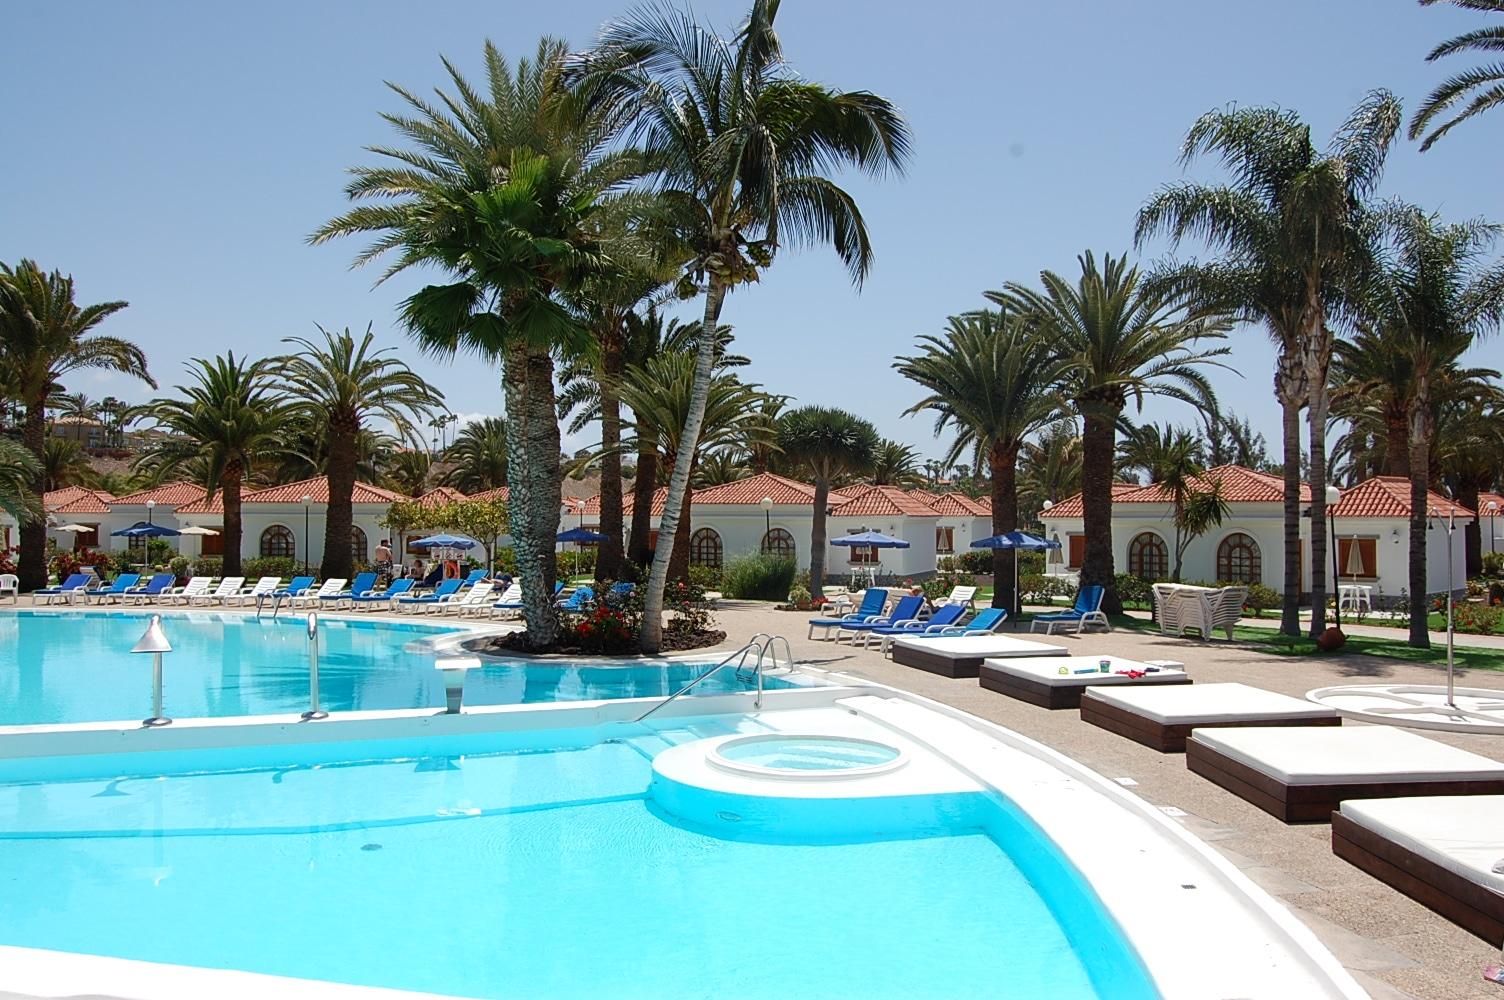 E hotels gran canaria web oficial apartamentos y hoteles for Hoteles 4 estrellas gran canaria